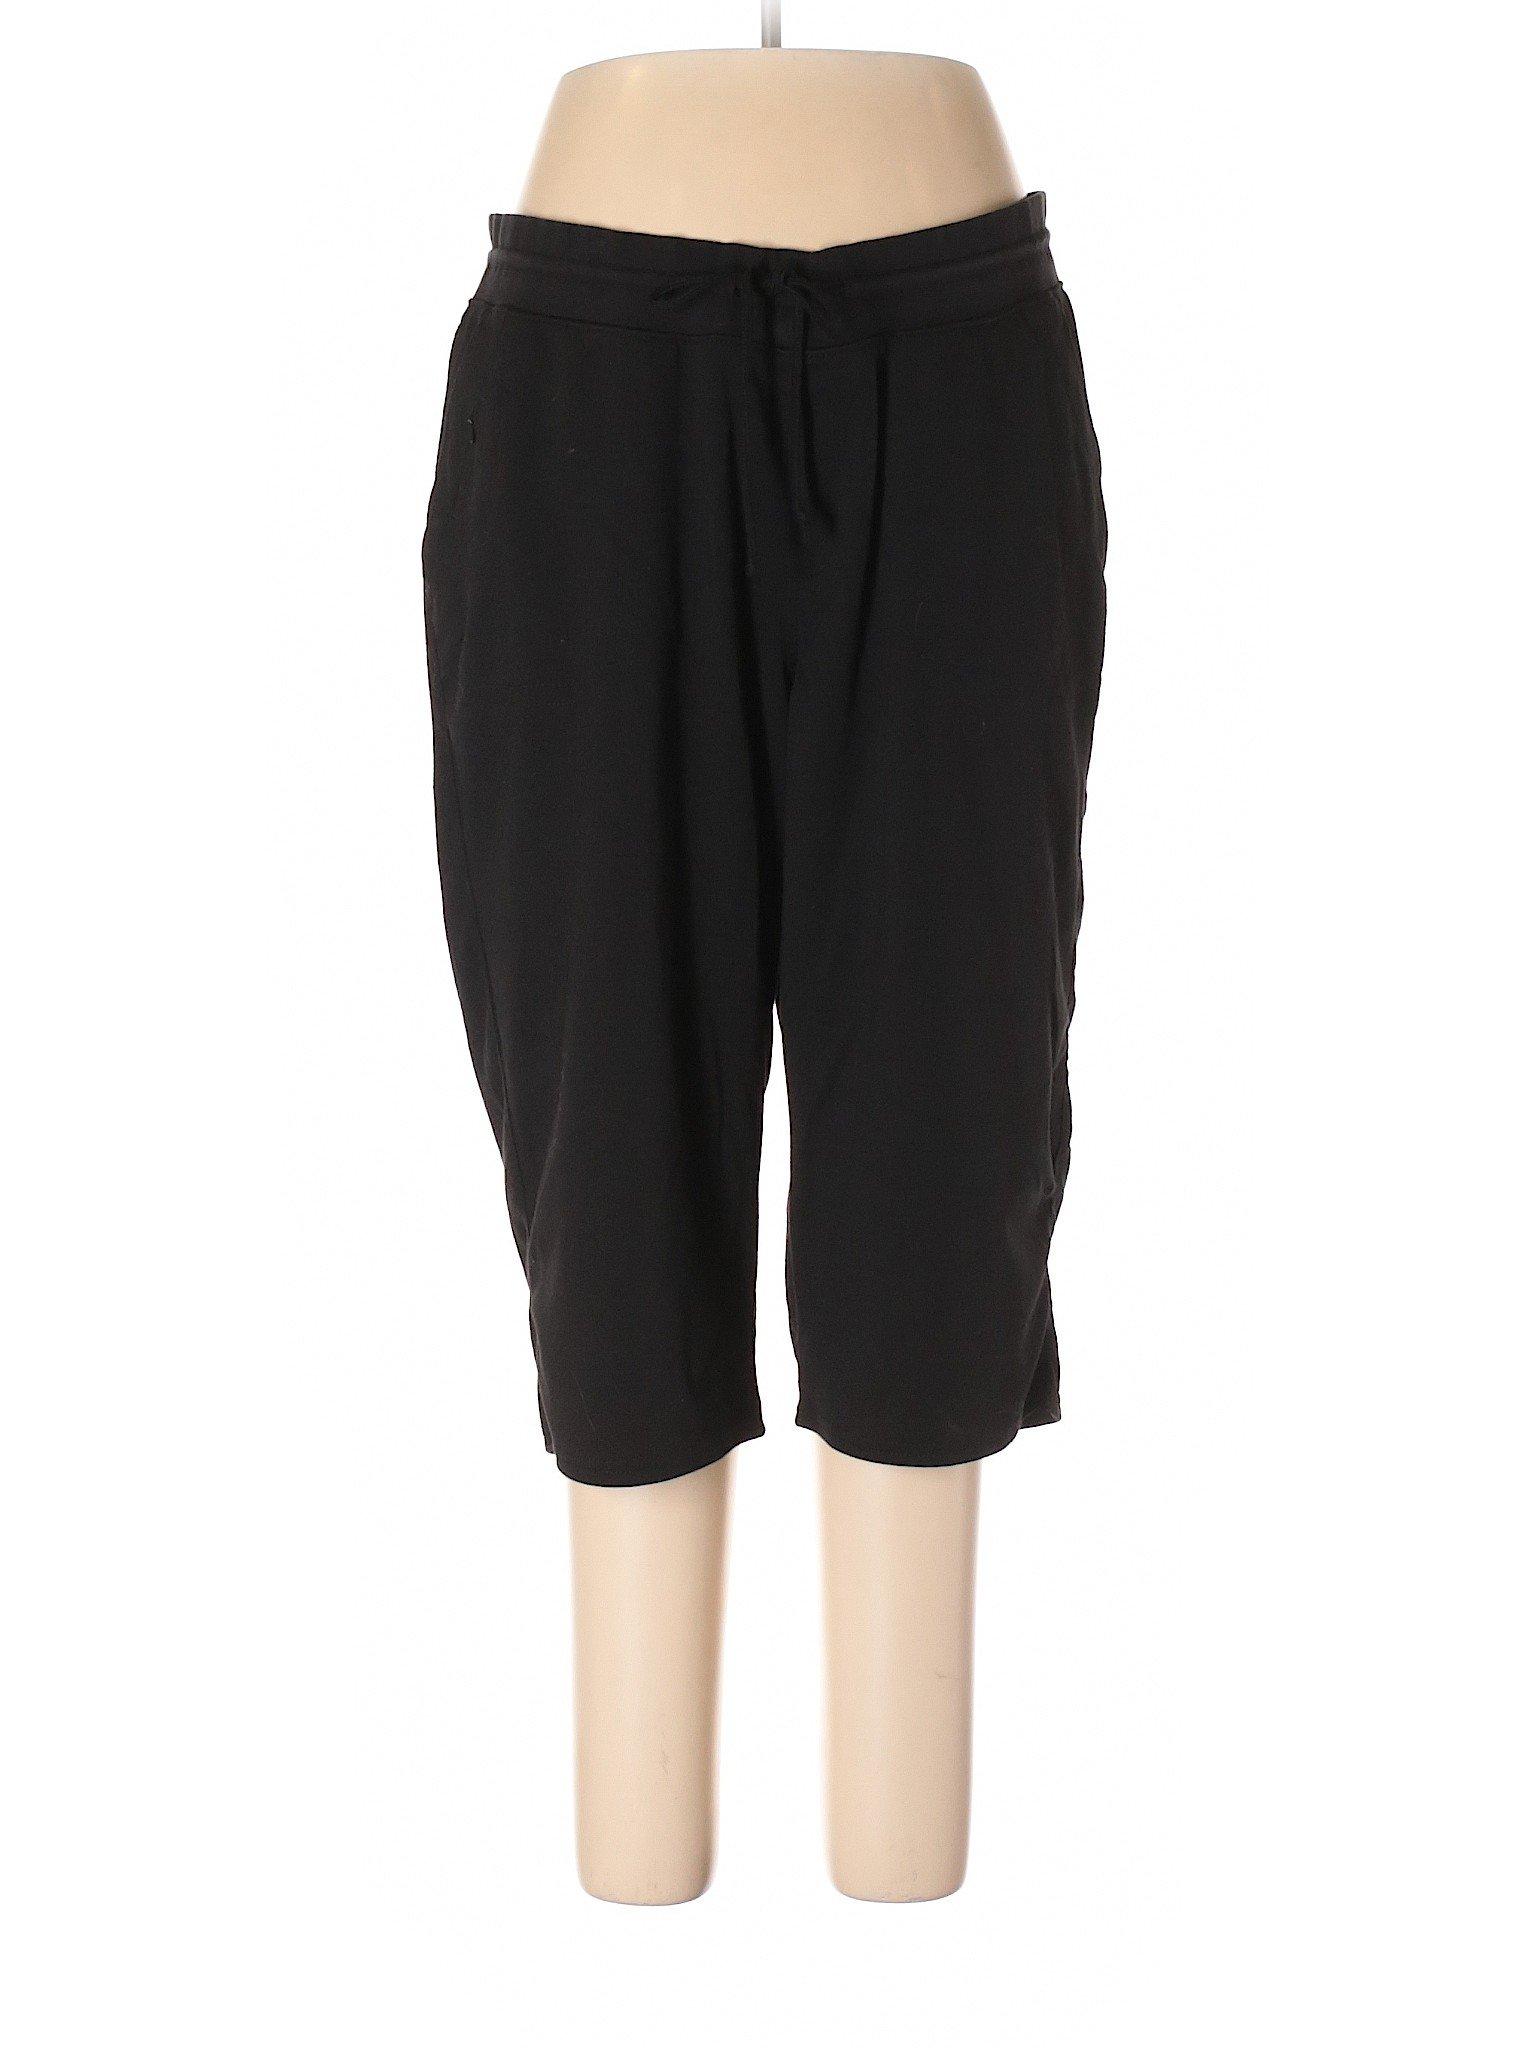 Boutique Casual Lee Lee winter winter Pants Boutique Pants Casual 7xv7r